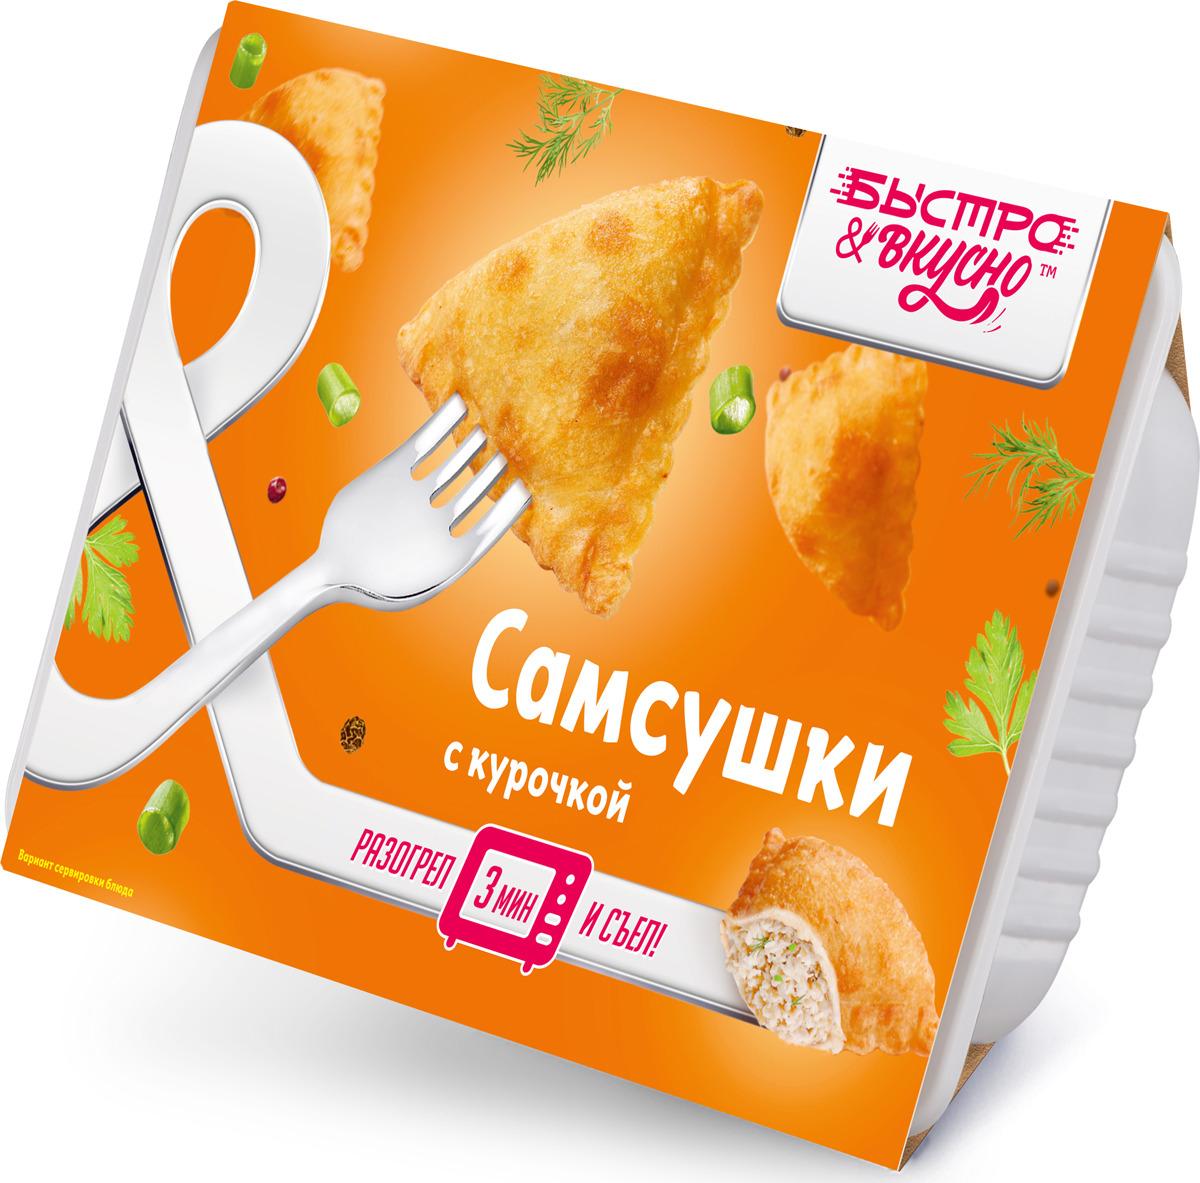 Пирожки Быстро вкусно Самсушки, 250 г аэрогриль варим вкусно жарим быстро печем легко